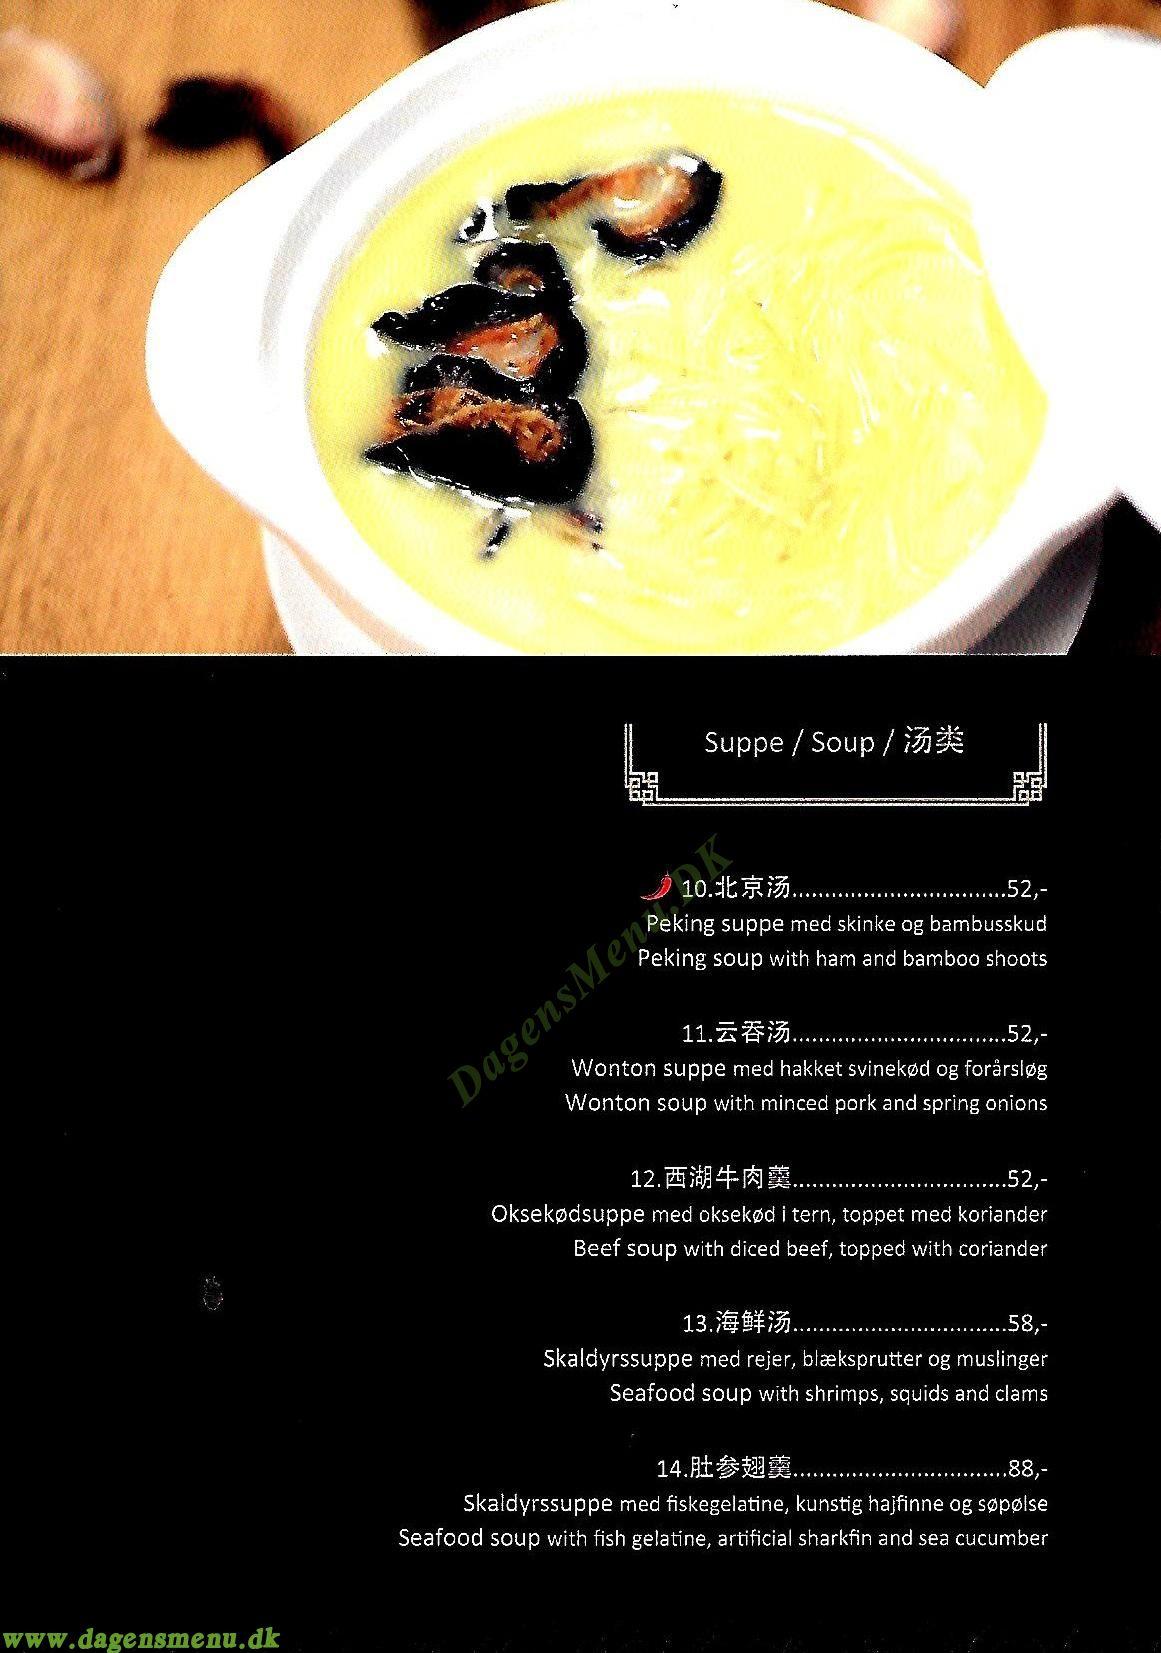 Mudan Kinesisk Restaurant - Menukort